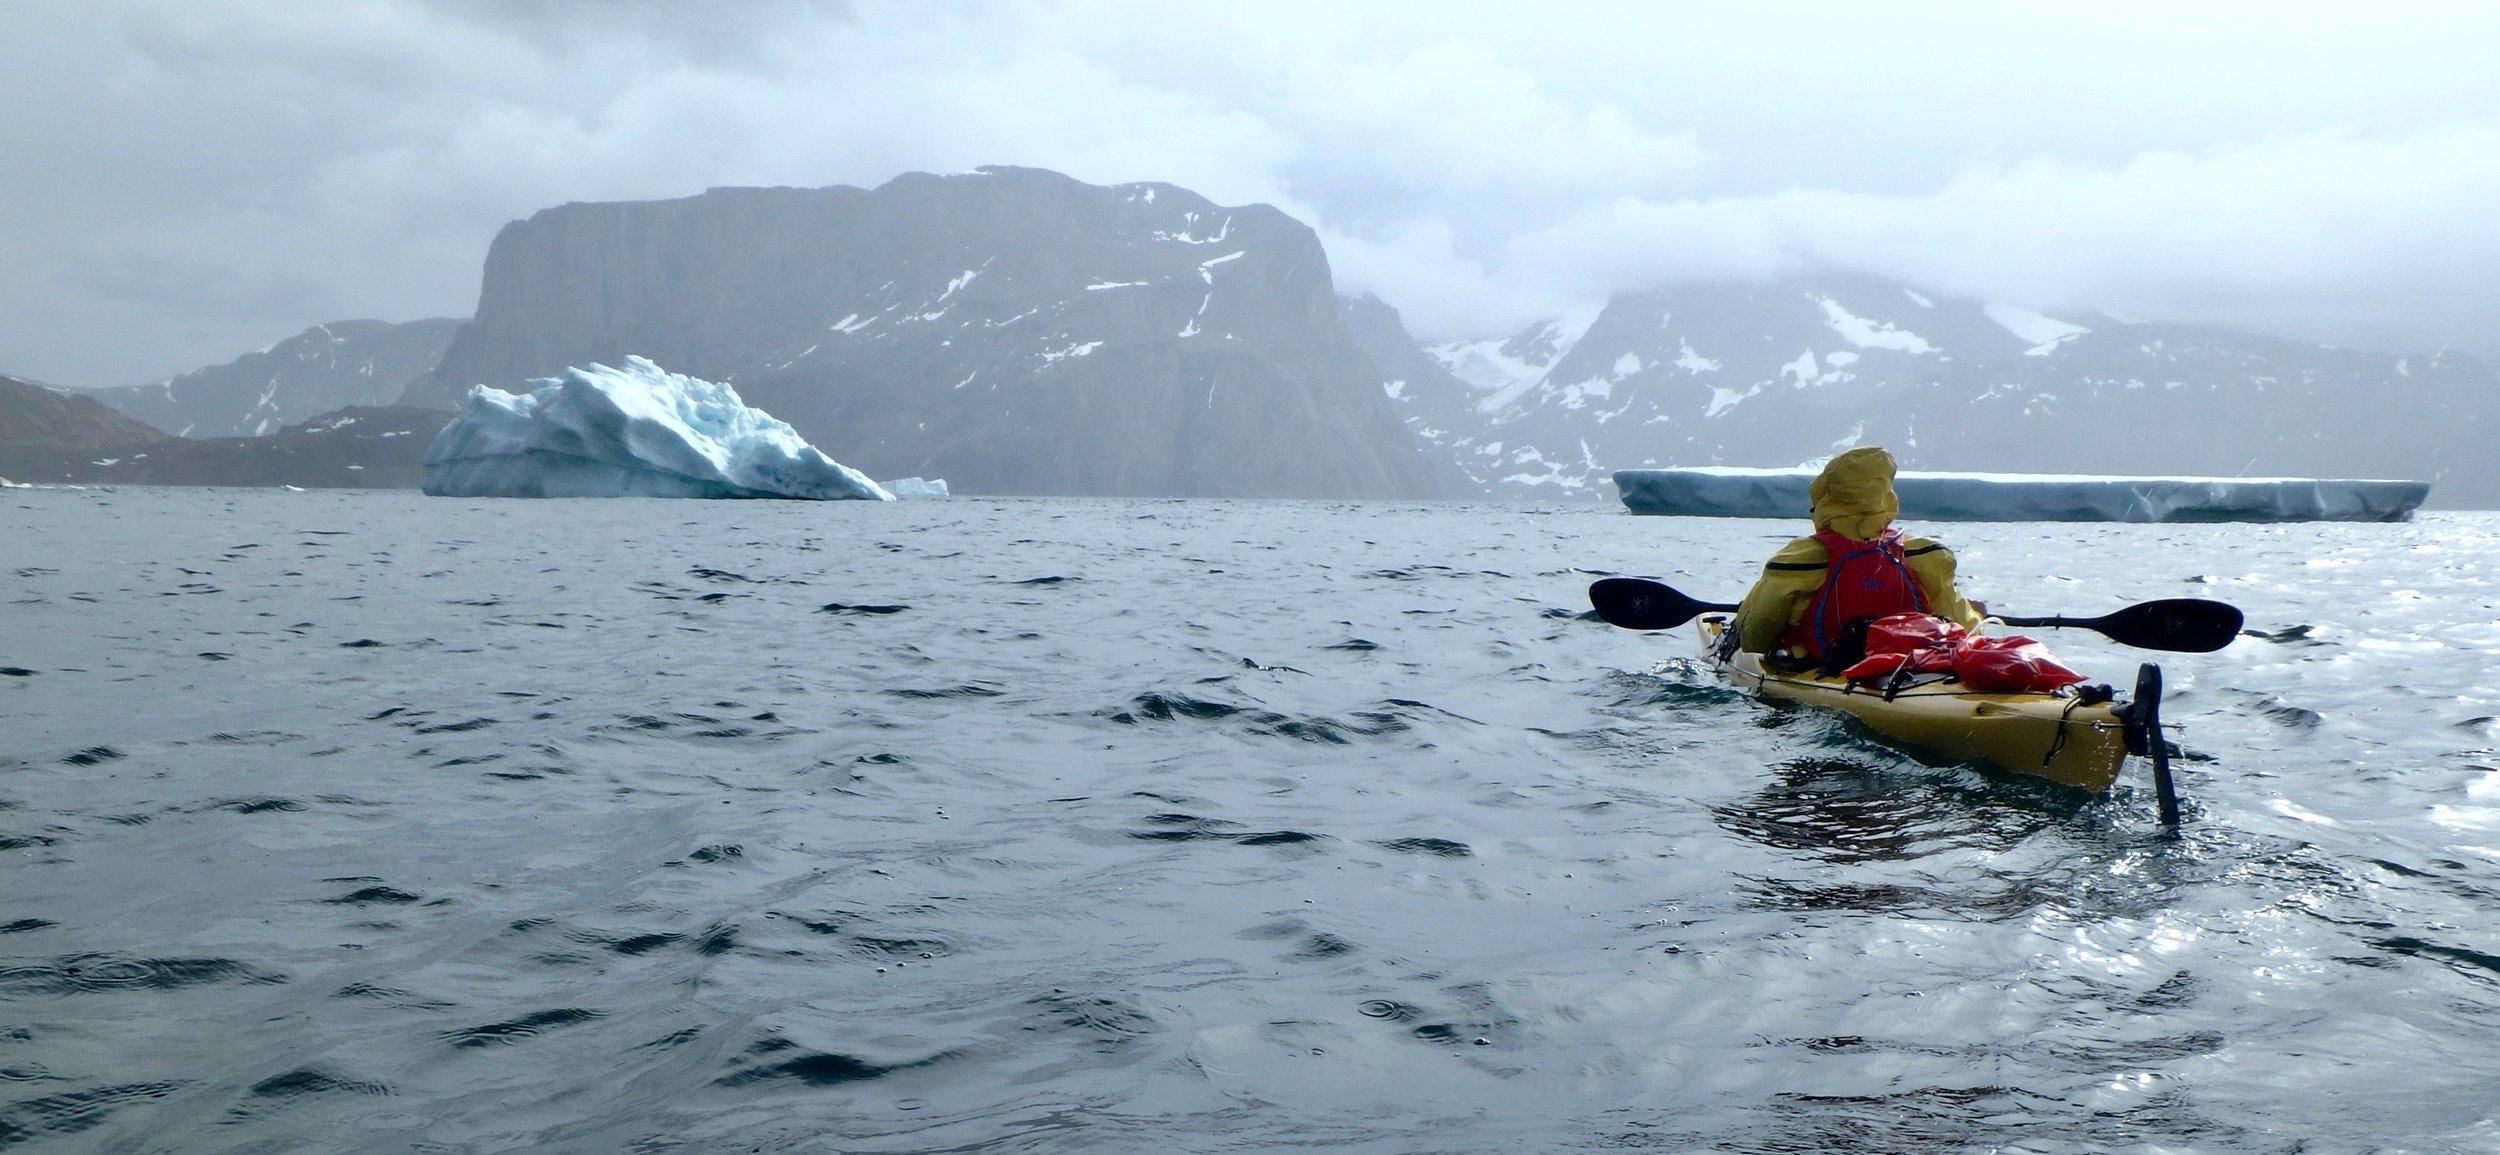 Roger sea kayaking in Greenland.